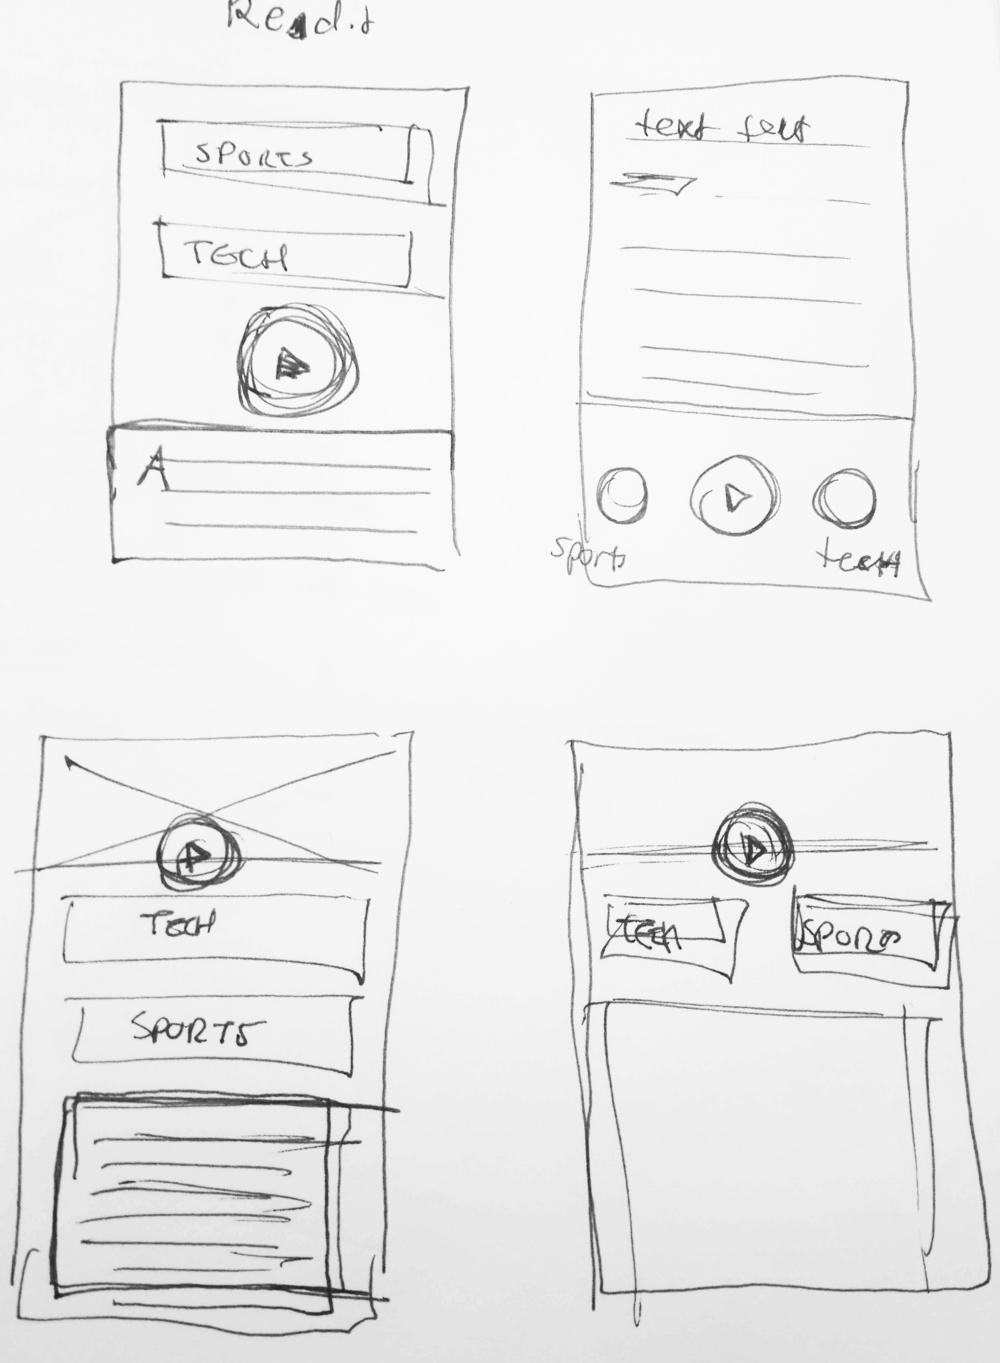 initial_sketch_1